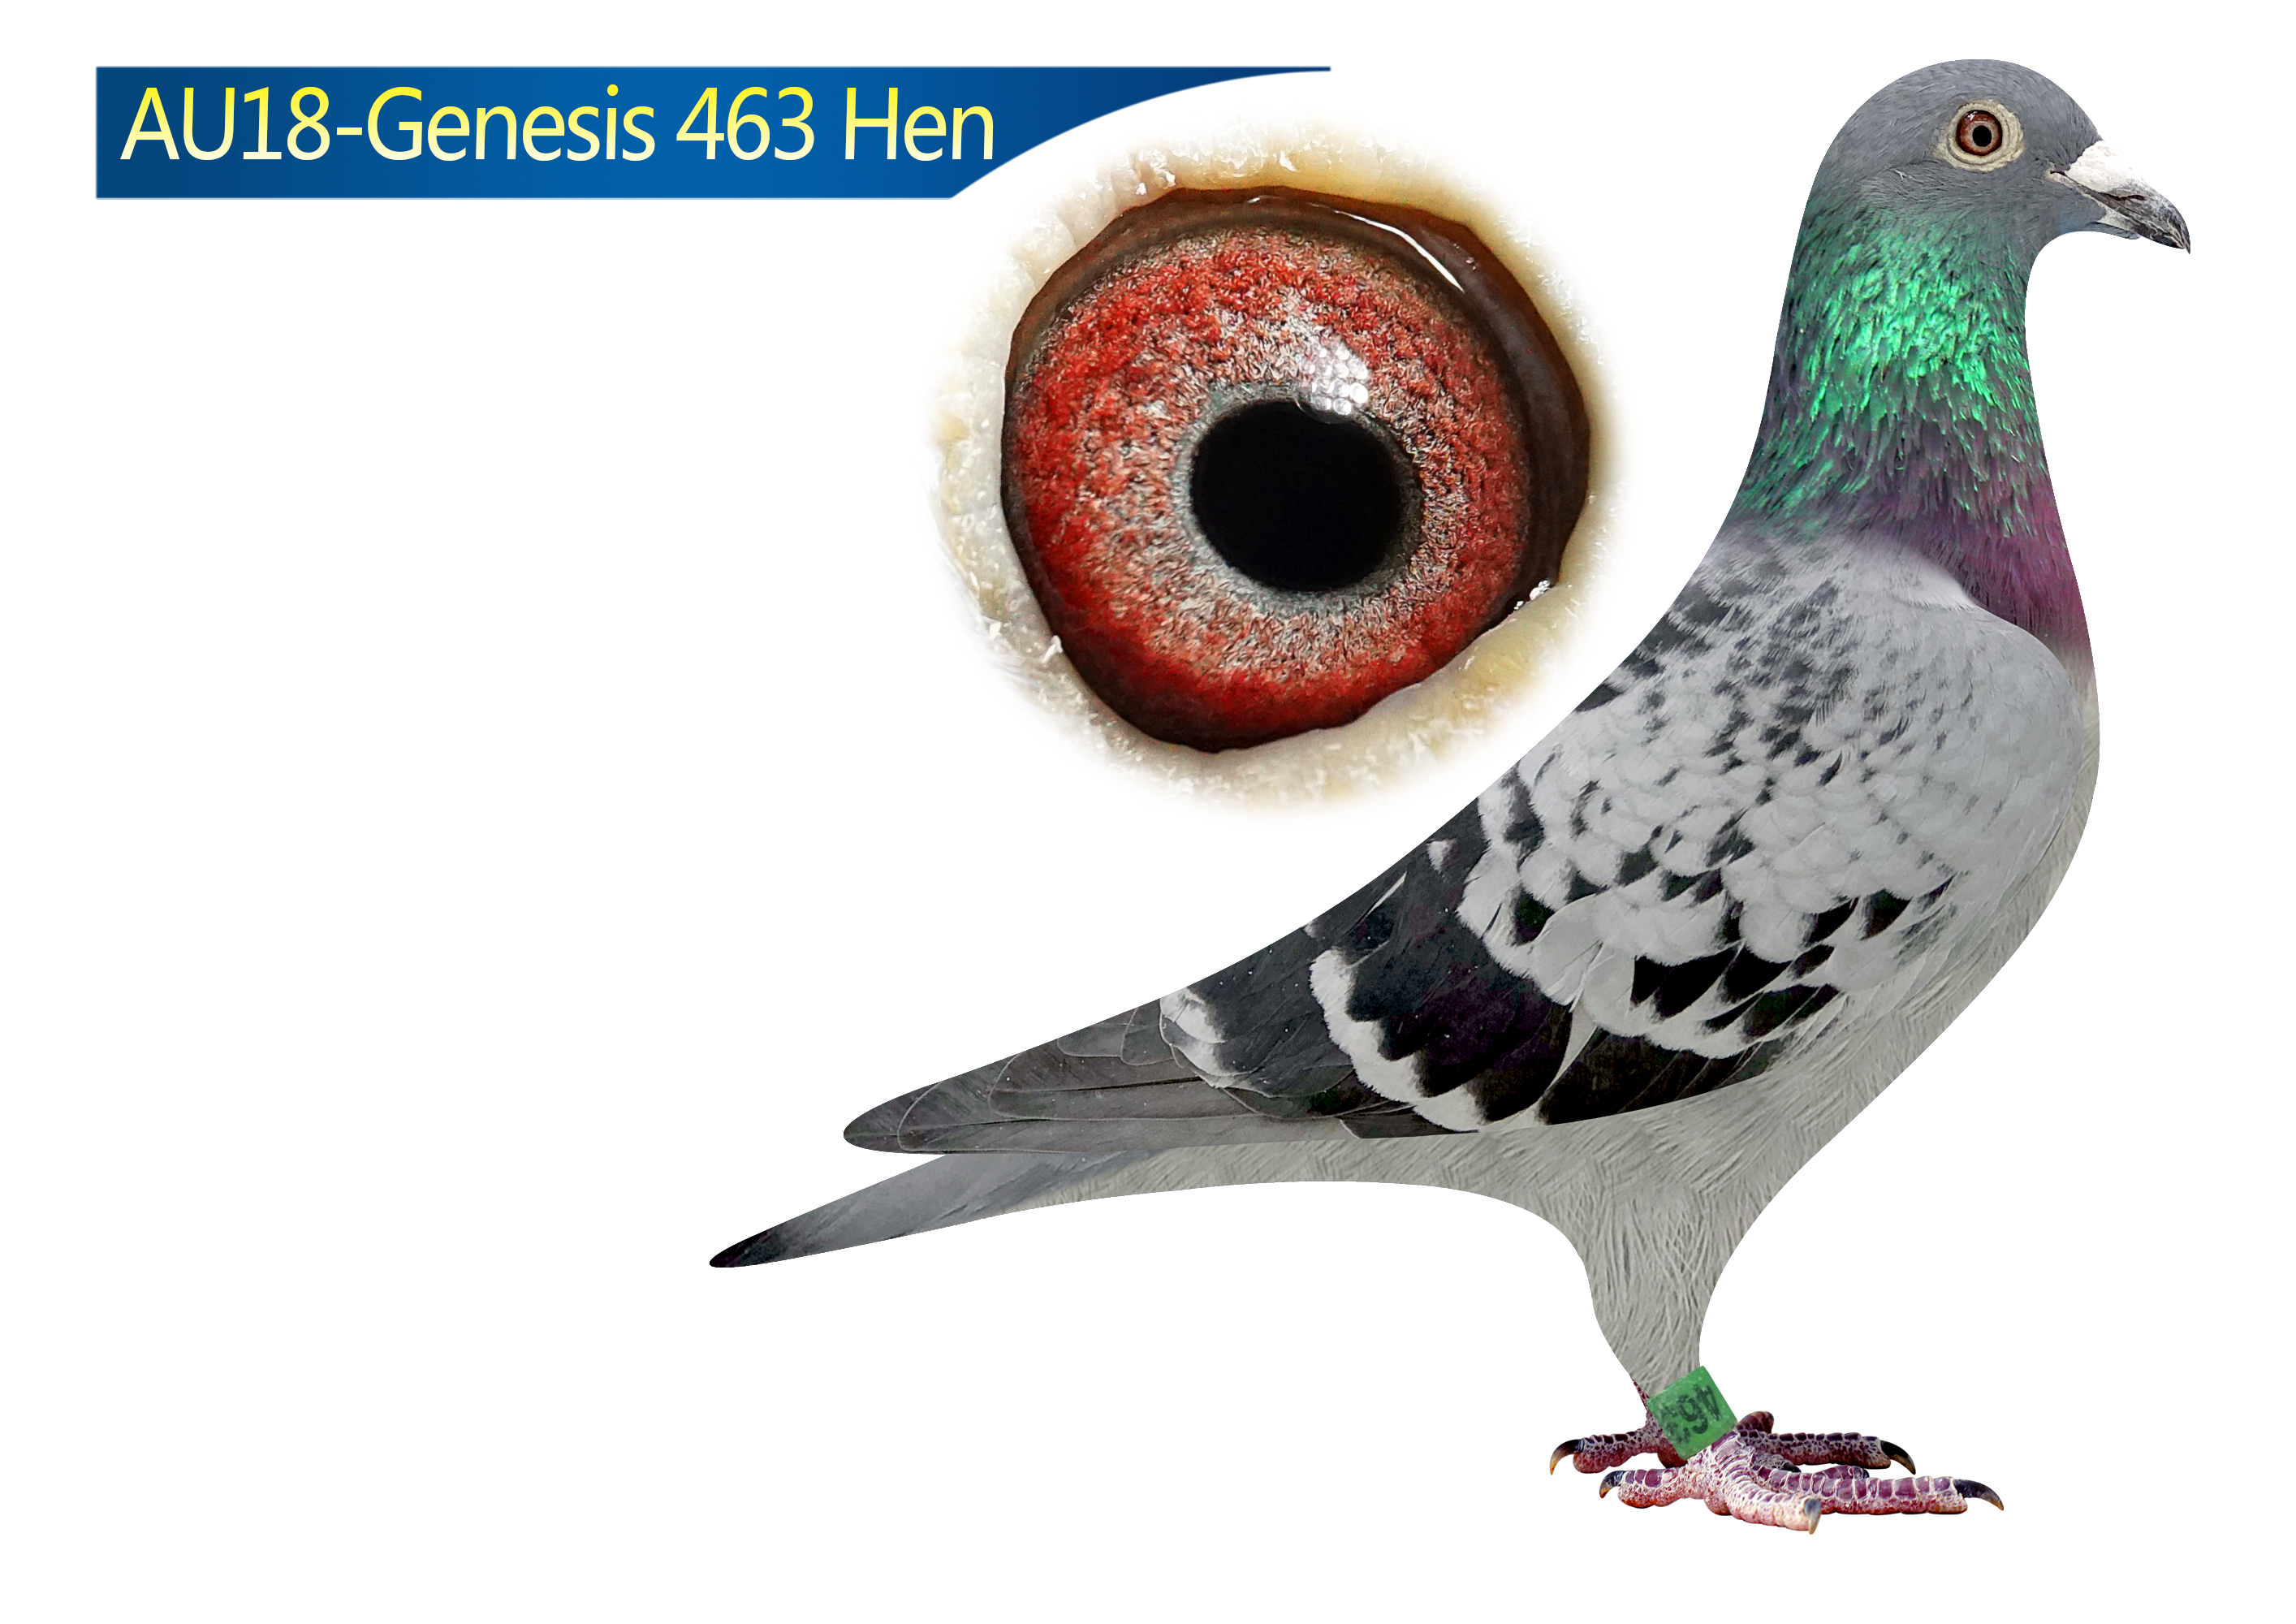 AU18-463 (Hen) Son of Charley X Tentil 610